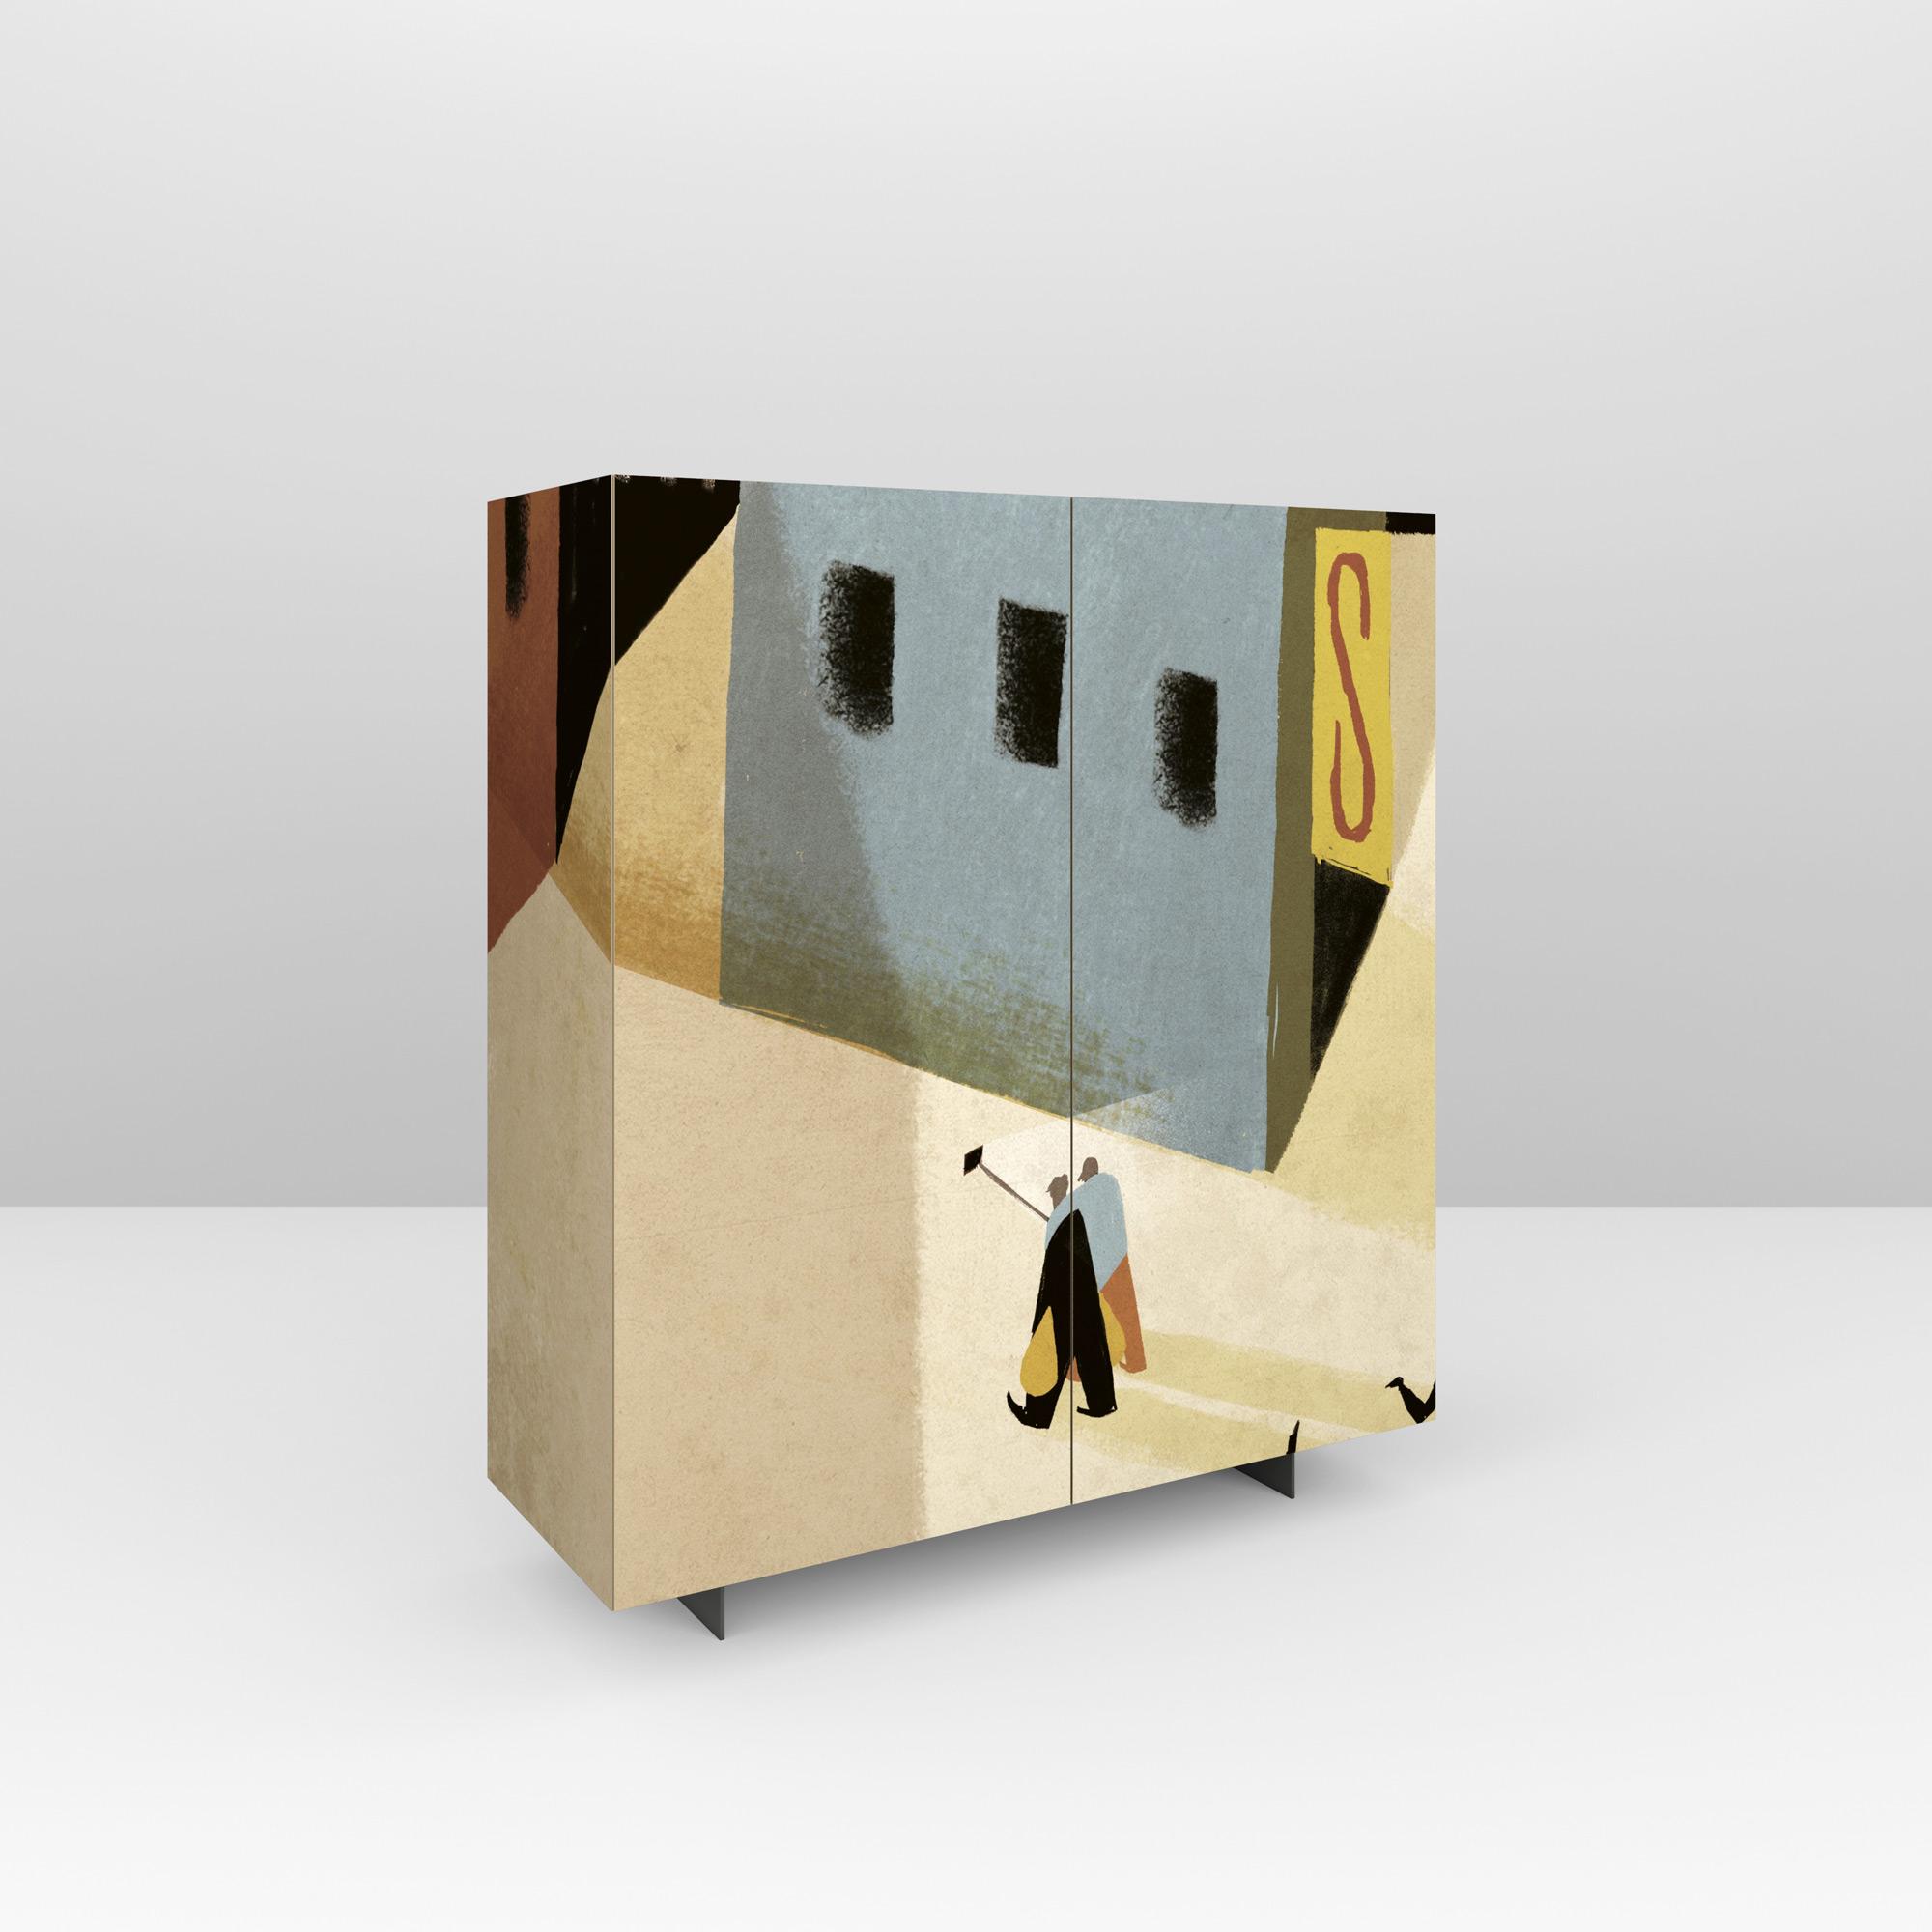 Pictoom Furniture Art Marogna Graphic Illustrator Furnishings Riccardo Guasco